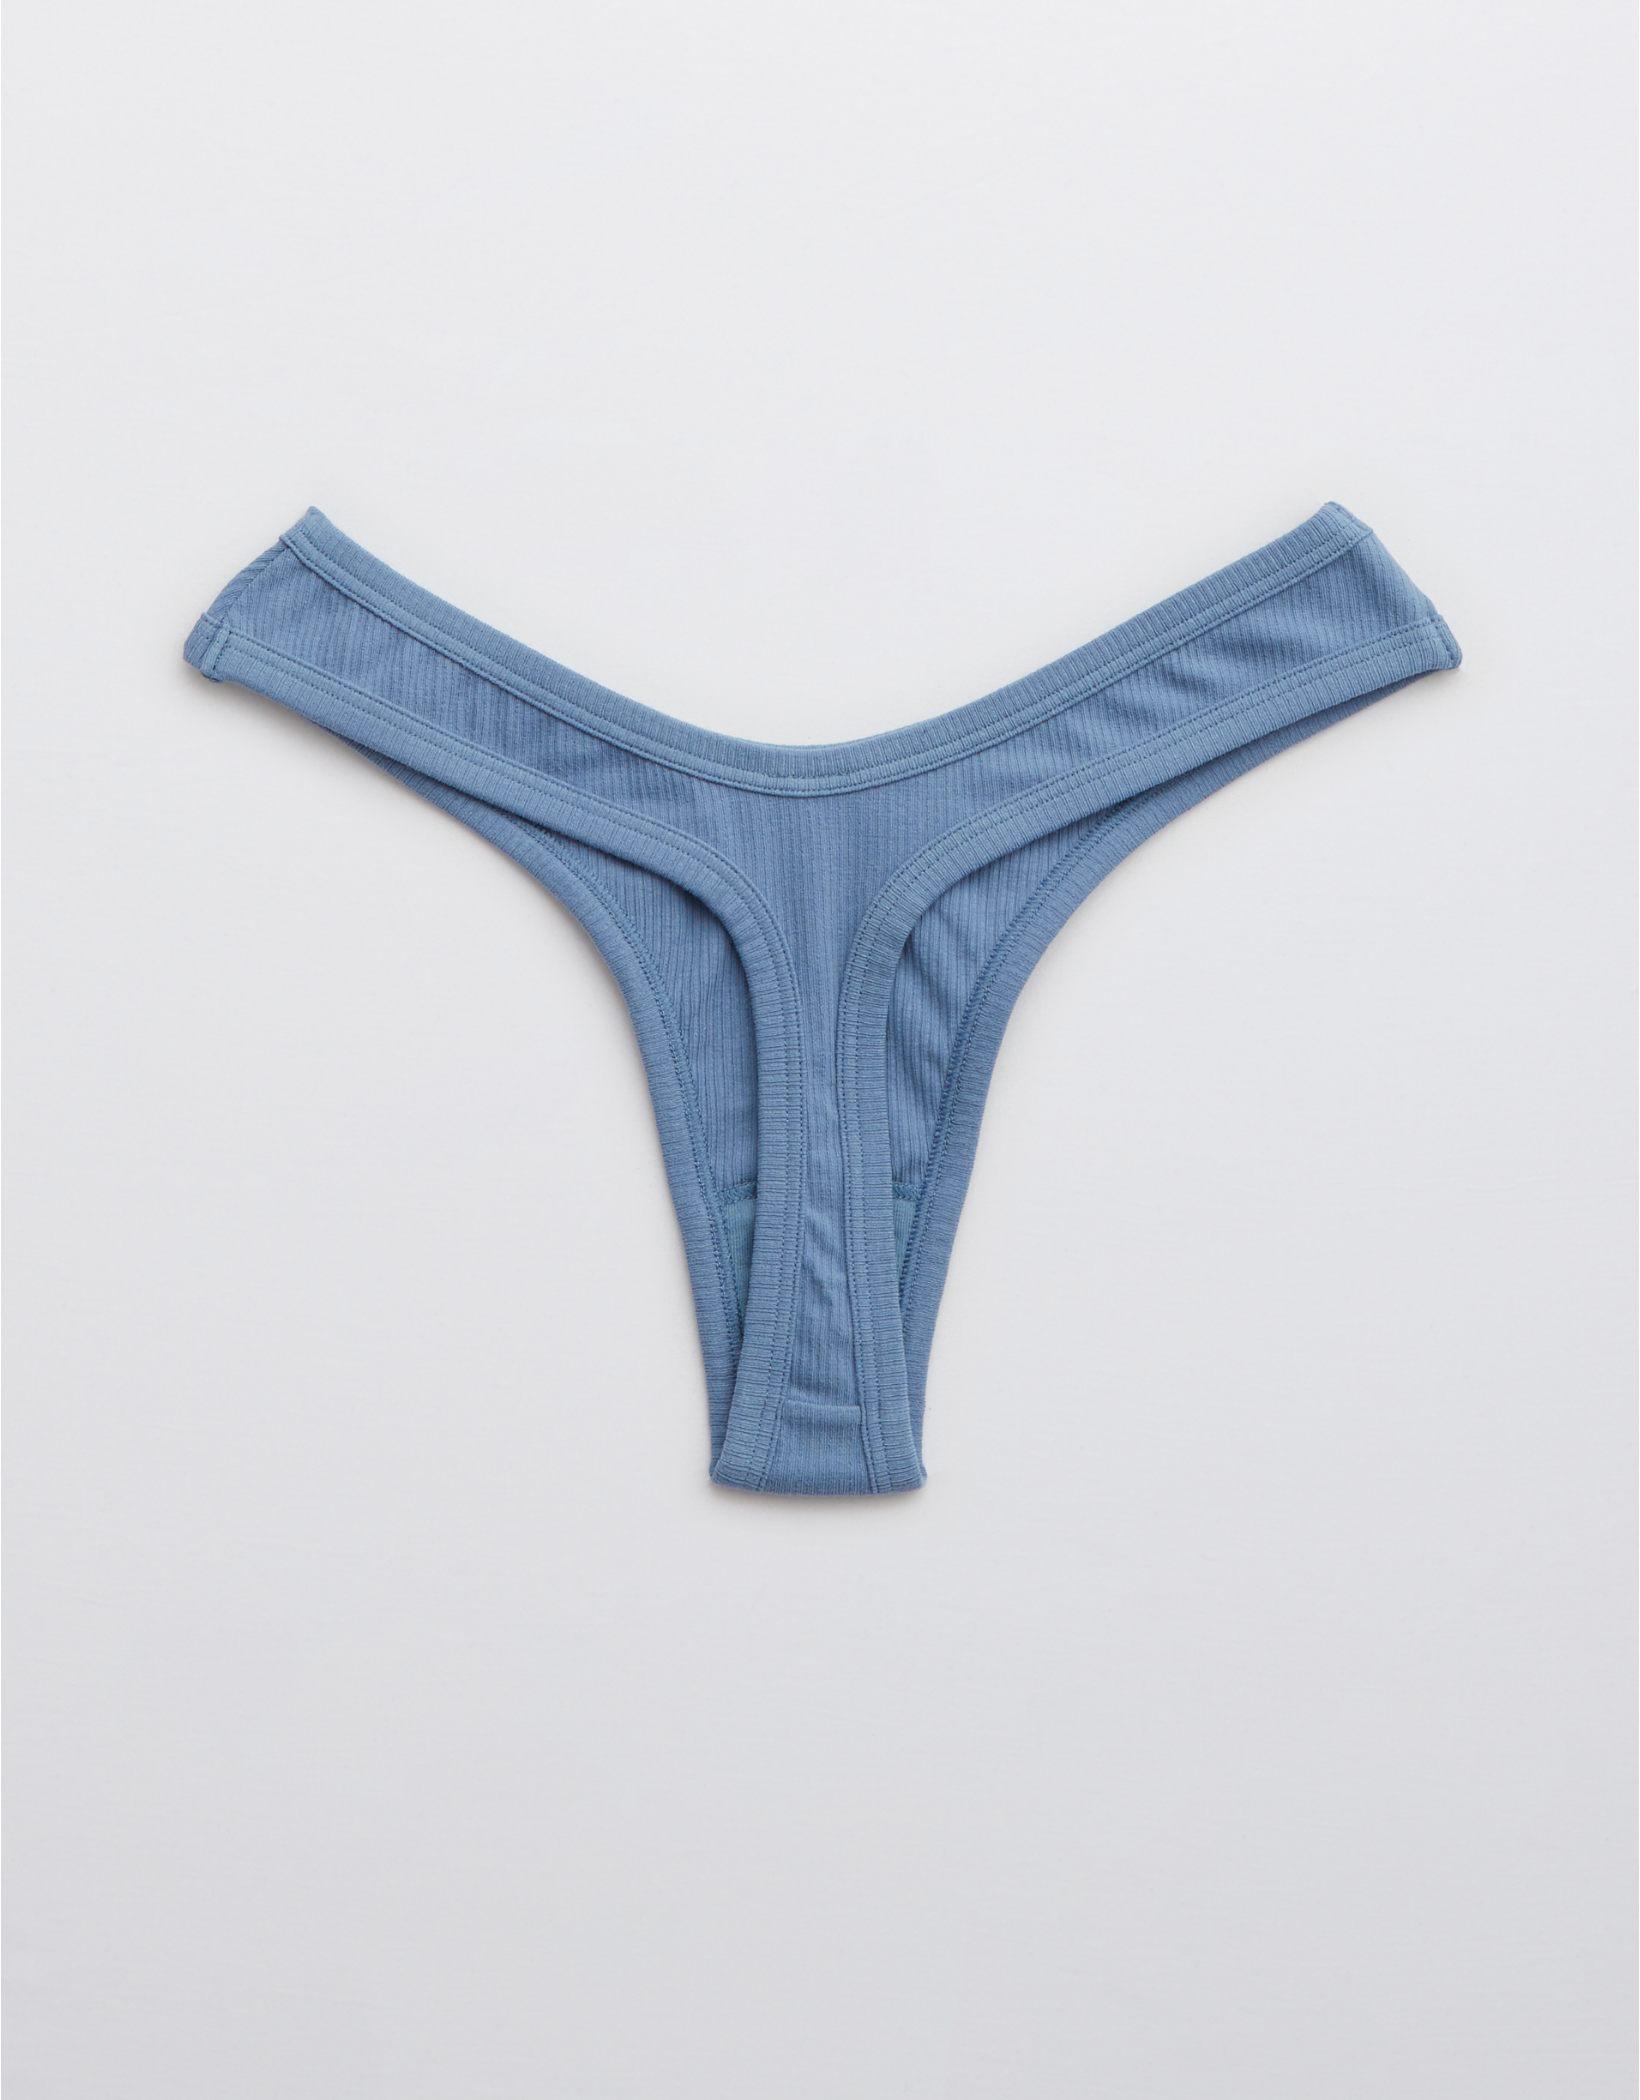 Aerie Ribbed Cotton High Cut Thong Underwear